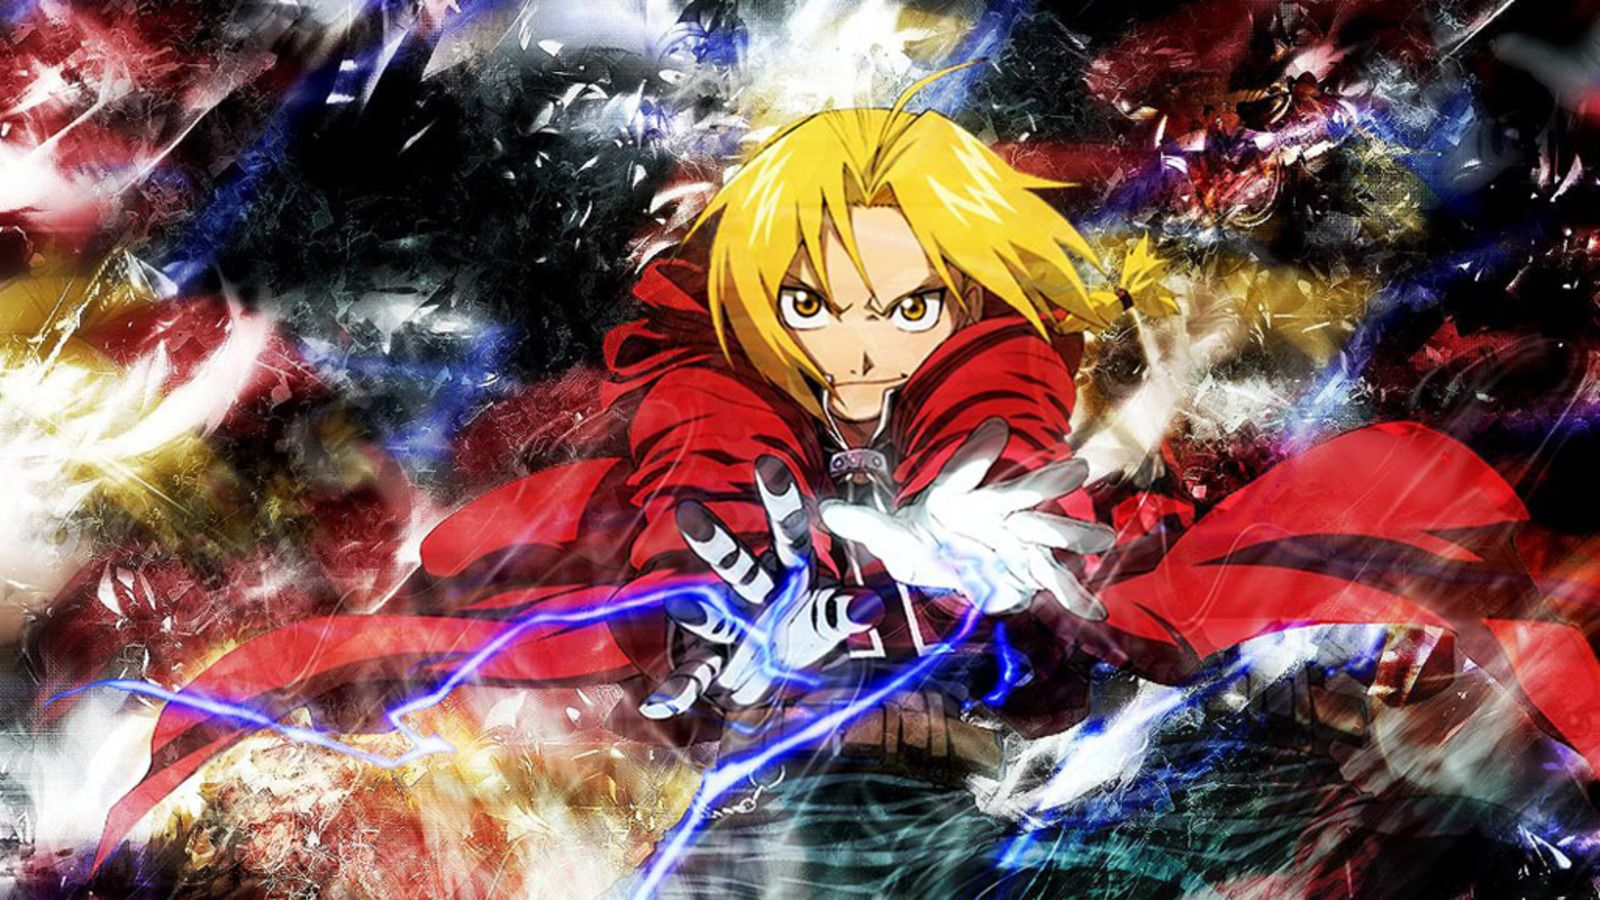 Fullmetal Alchemist Brotherhood Wallpapers 3945 Hd Wallpaper Site Anime